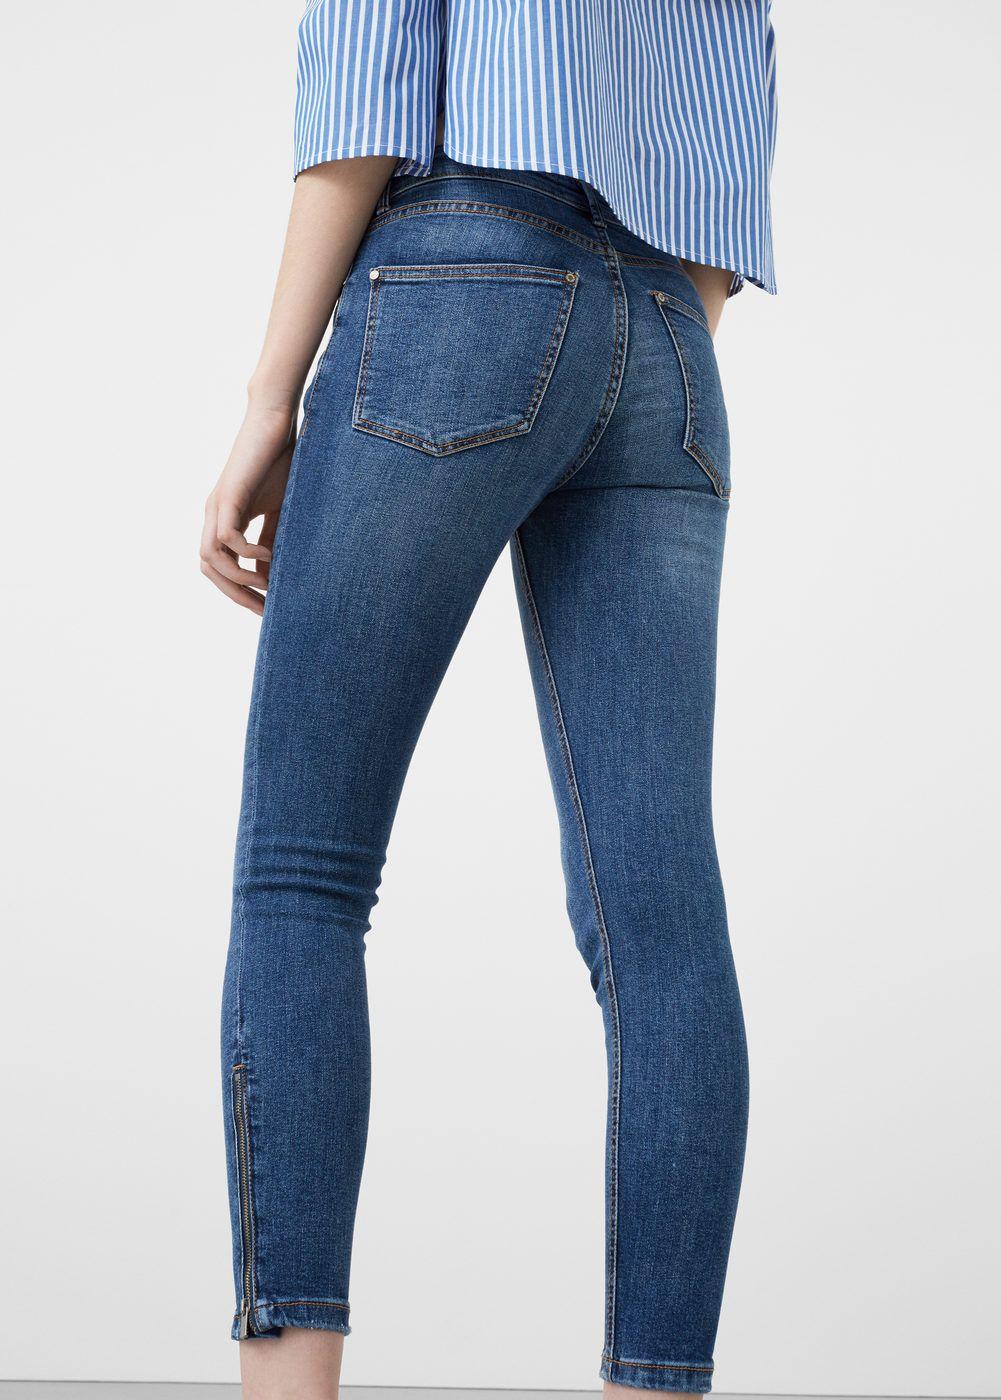 d9b74a5f6d1 Jeans skinny crop tattoo - Mujer   Basics   Pantalones de chicos ...